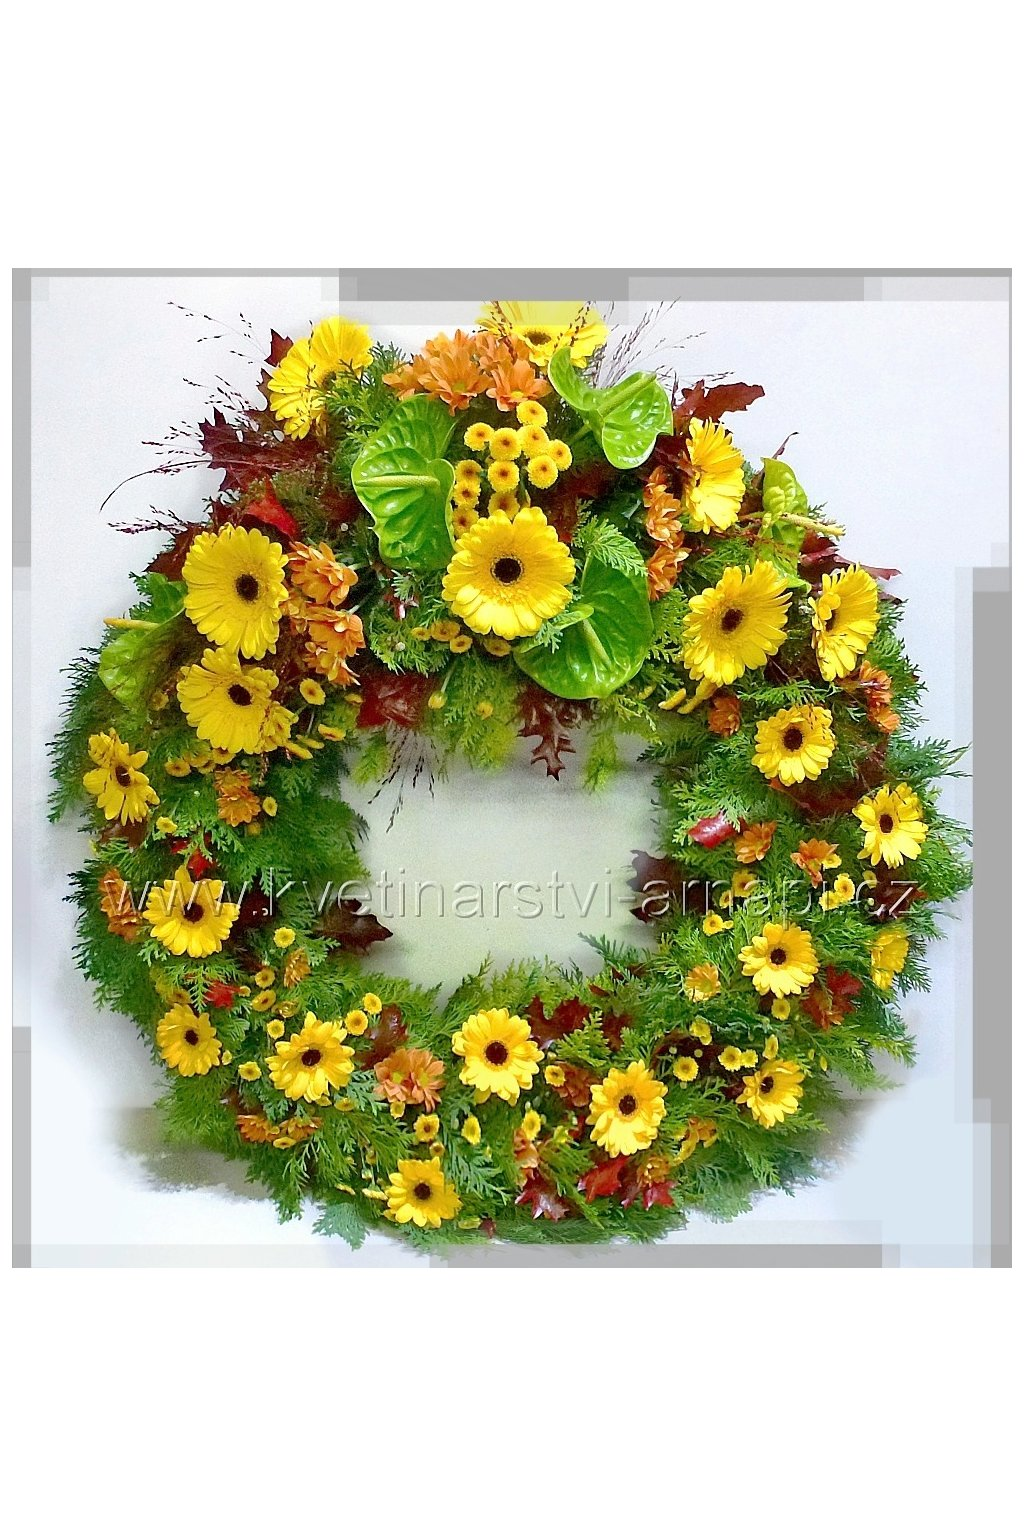 venec smutecni rozvoz kvetin kvetinarstvi arnapi